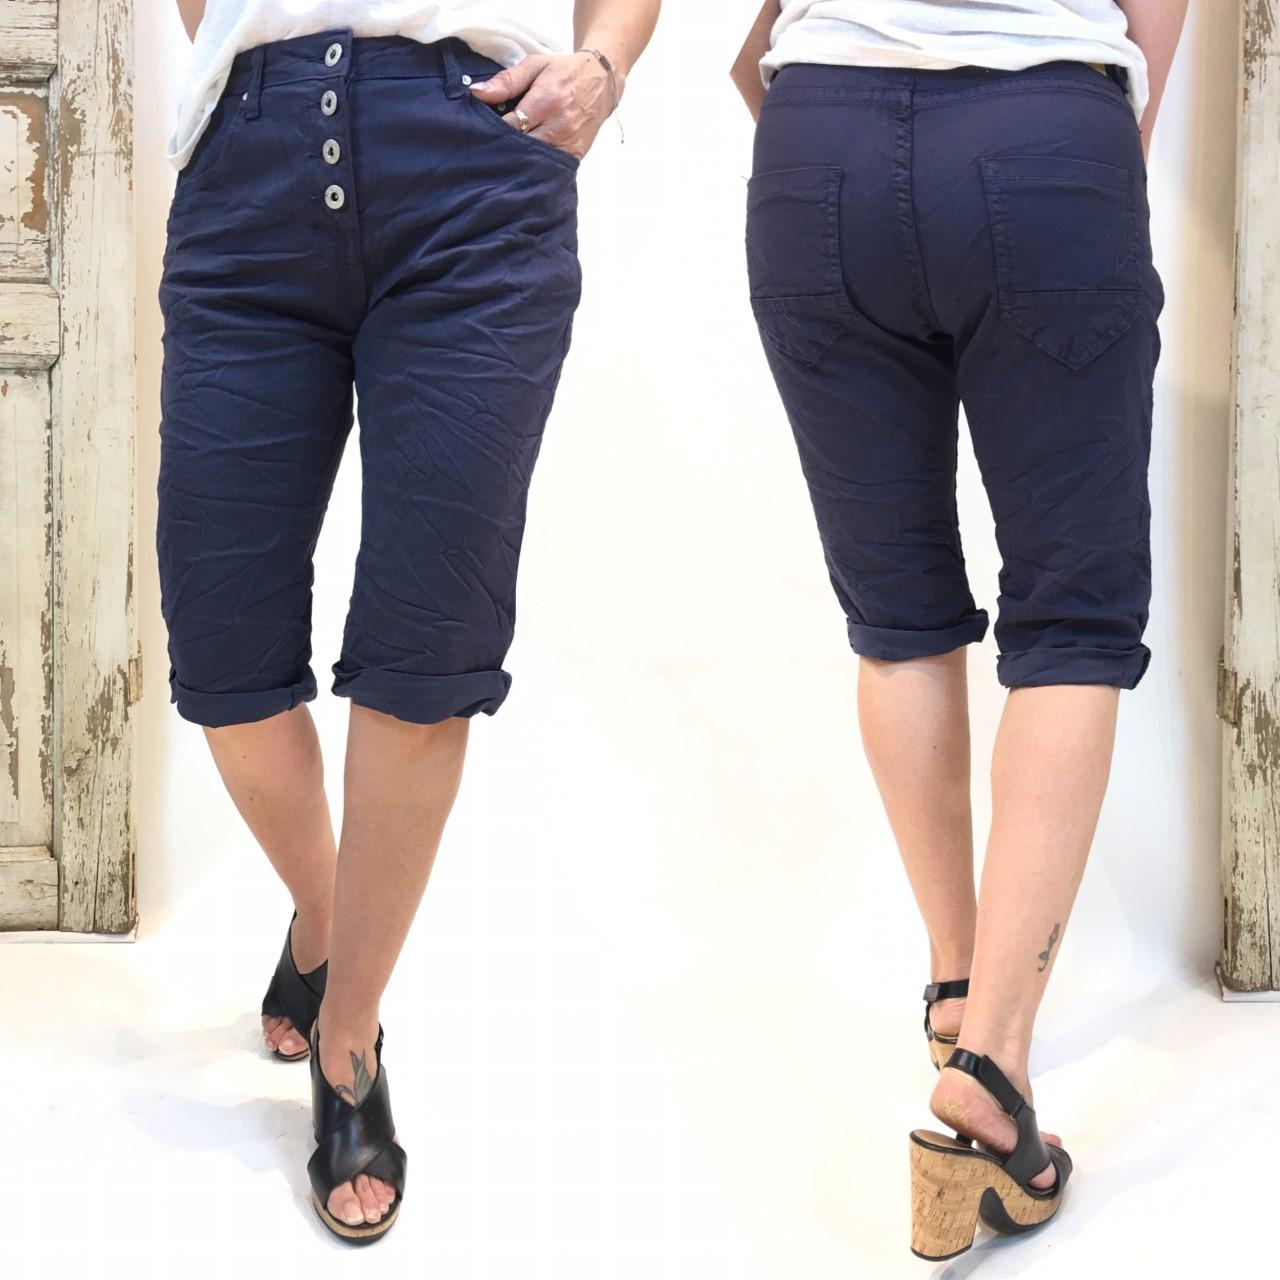 marineblå shorts